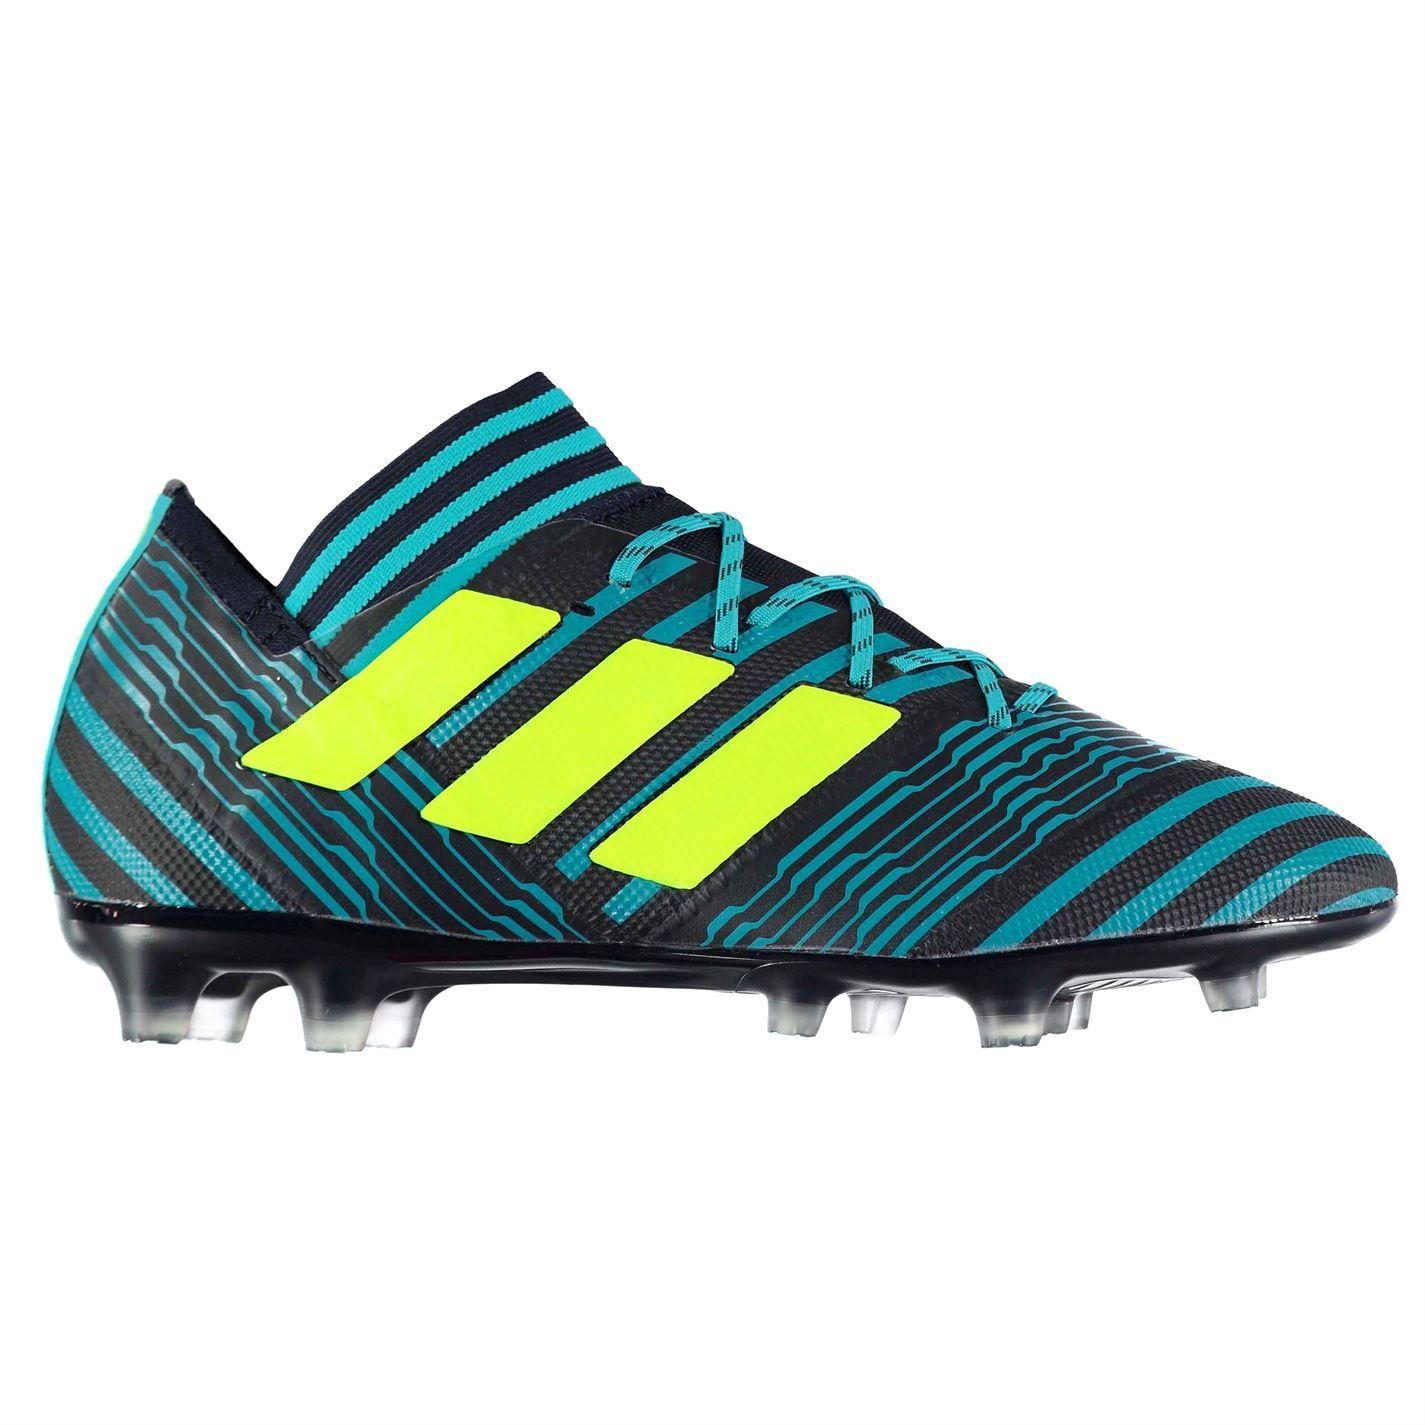 bd85e4fbd8f ... adidas Nemeziz 17.2 FG Firm Ground Football Boots Mens Blue Soccer Shoes  Cleats ...